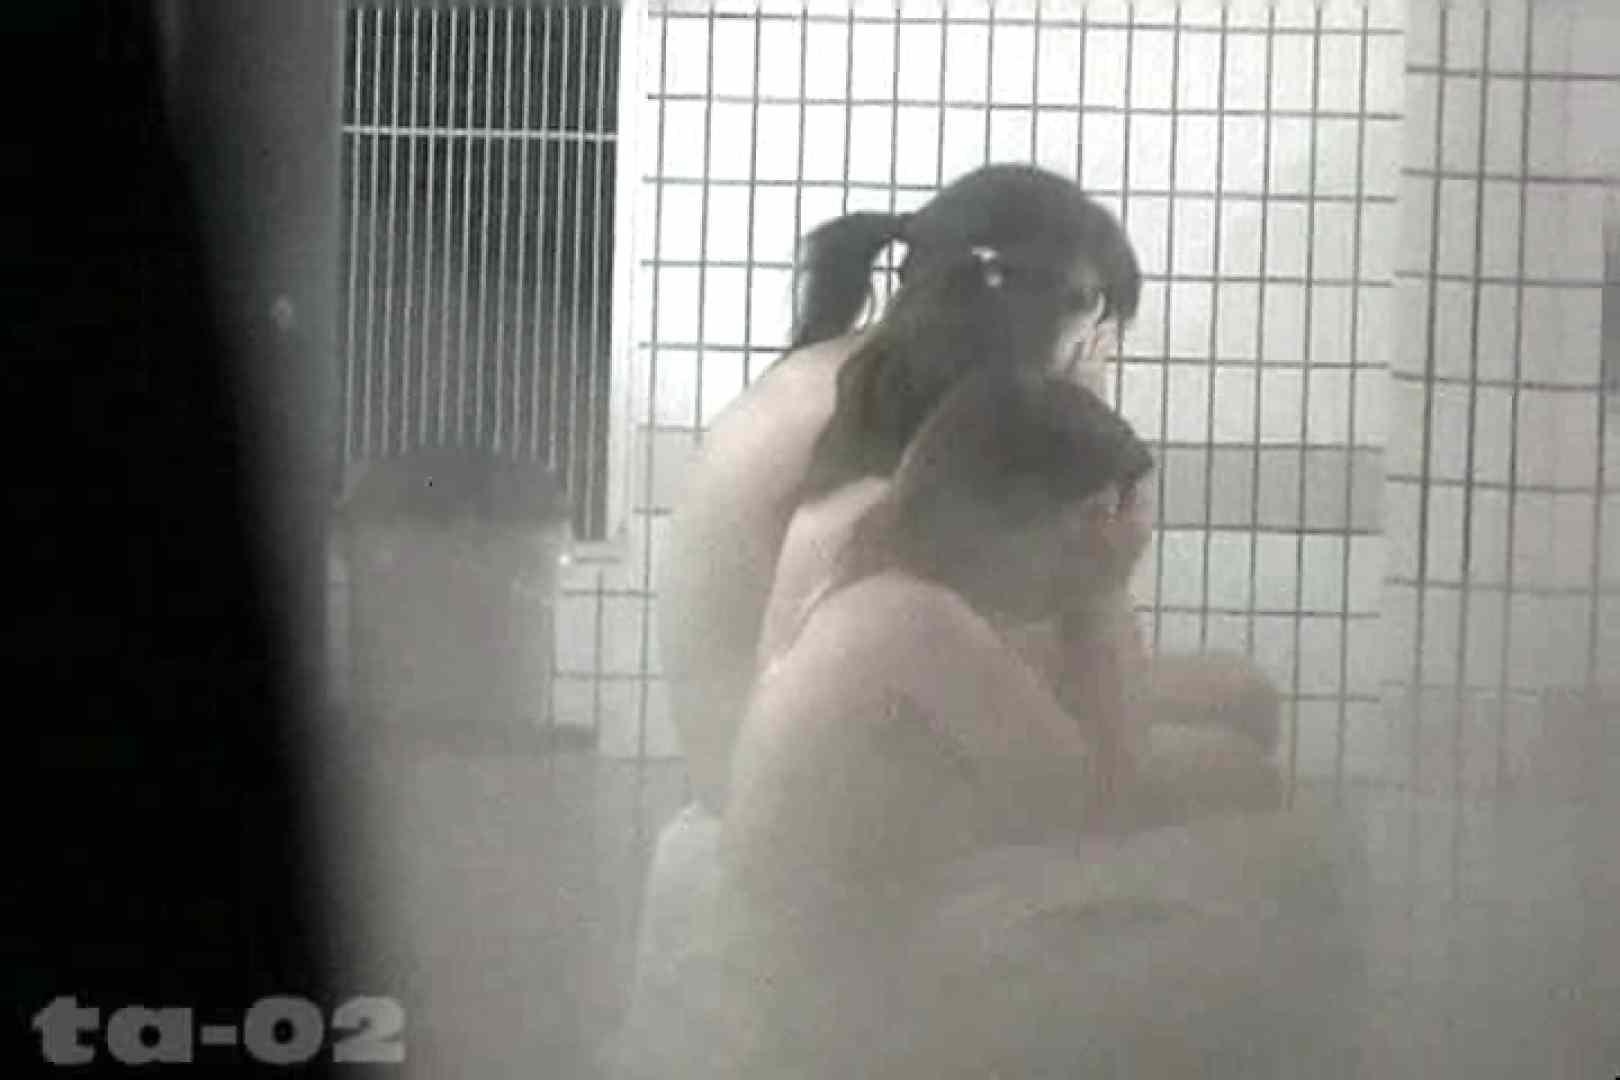 合宿ホテル女風呂盗撮高画質版 Vol.02 盗撮  81PIX 10